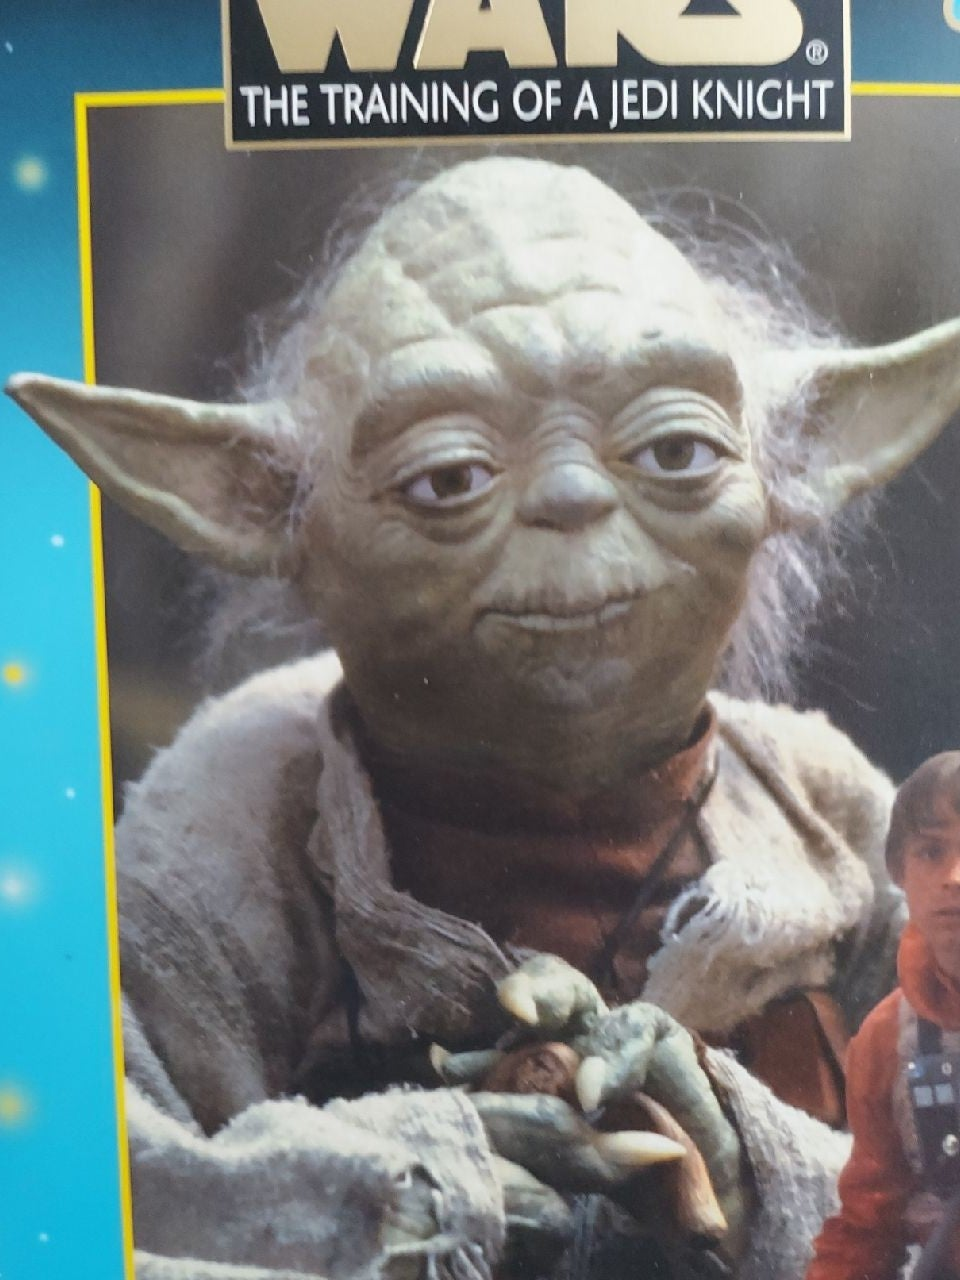 Star Wars training of a jedi Knight Yod